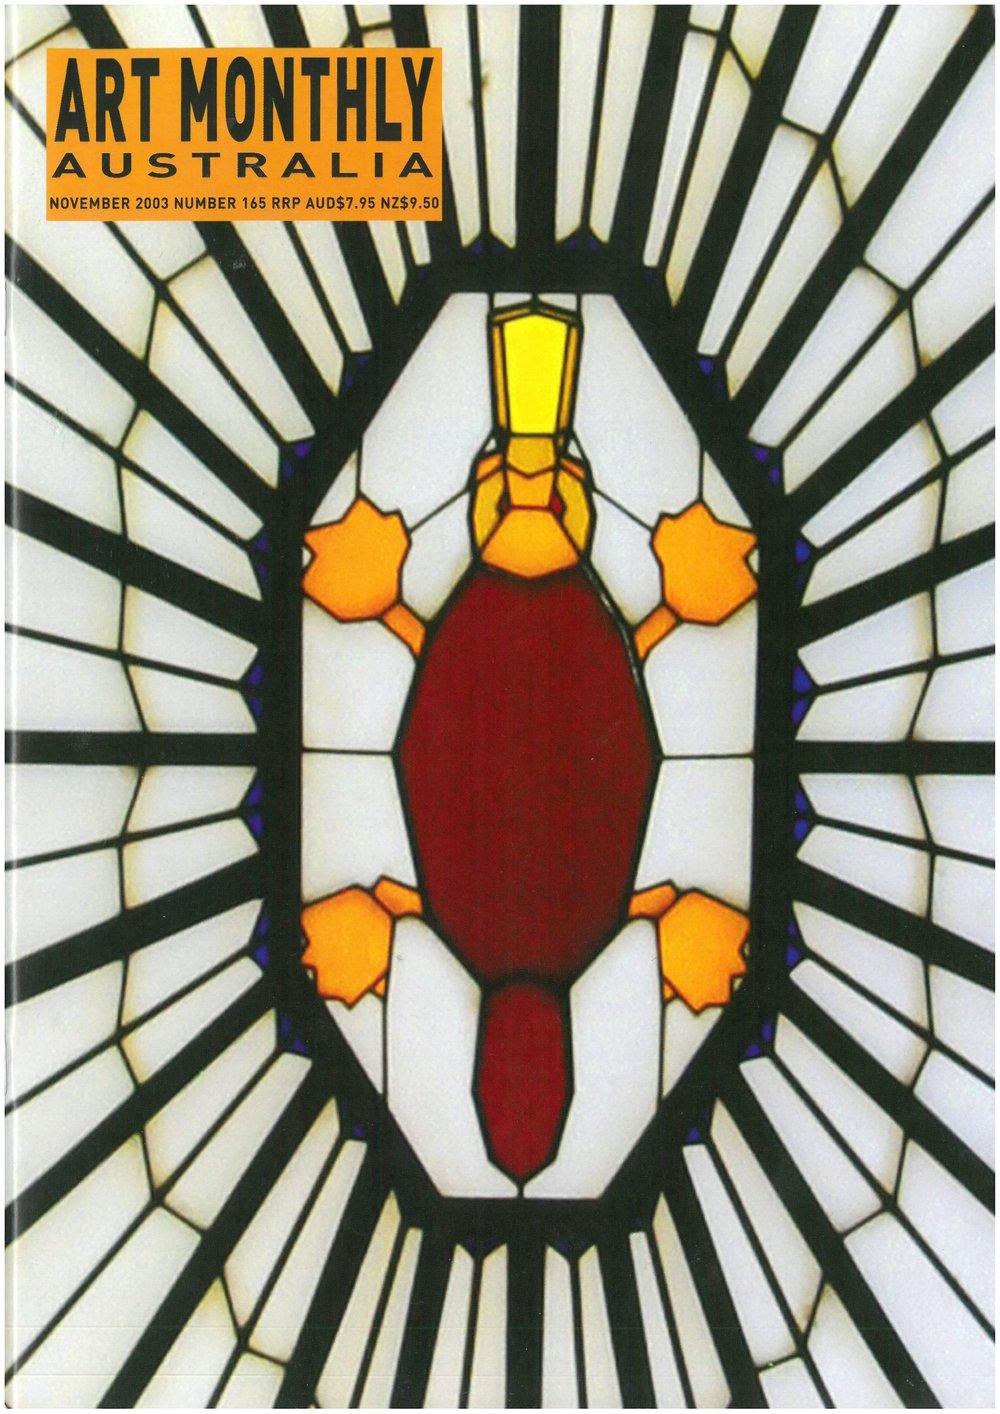 Issue 165 November 2003